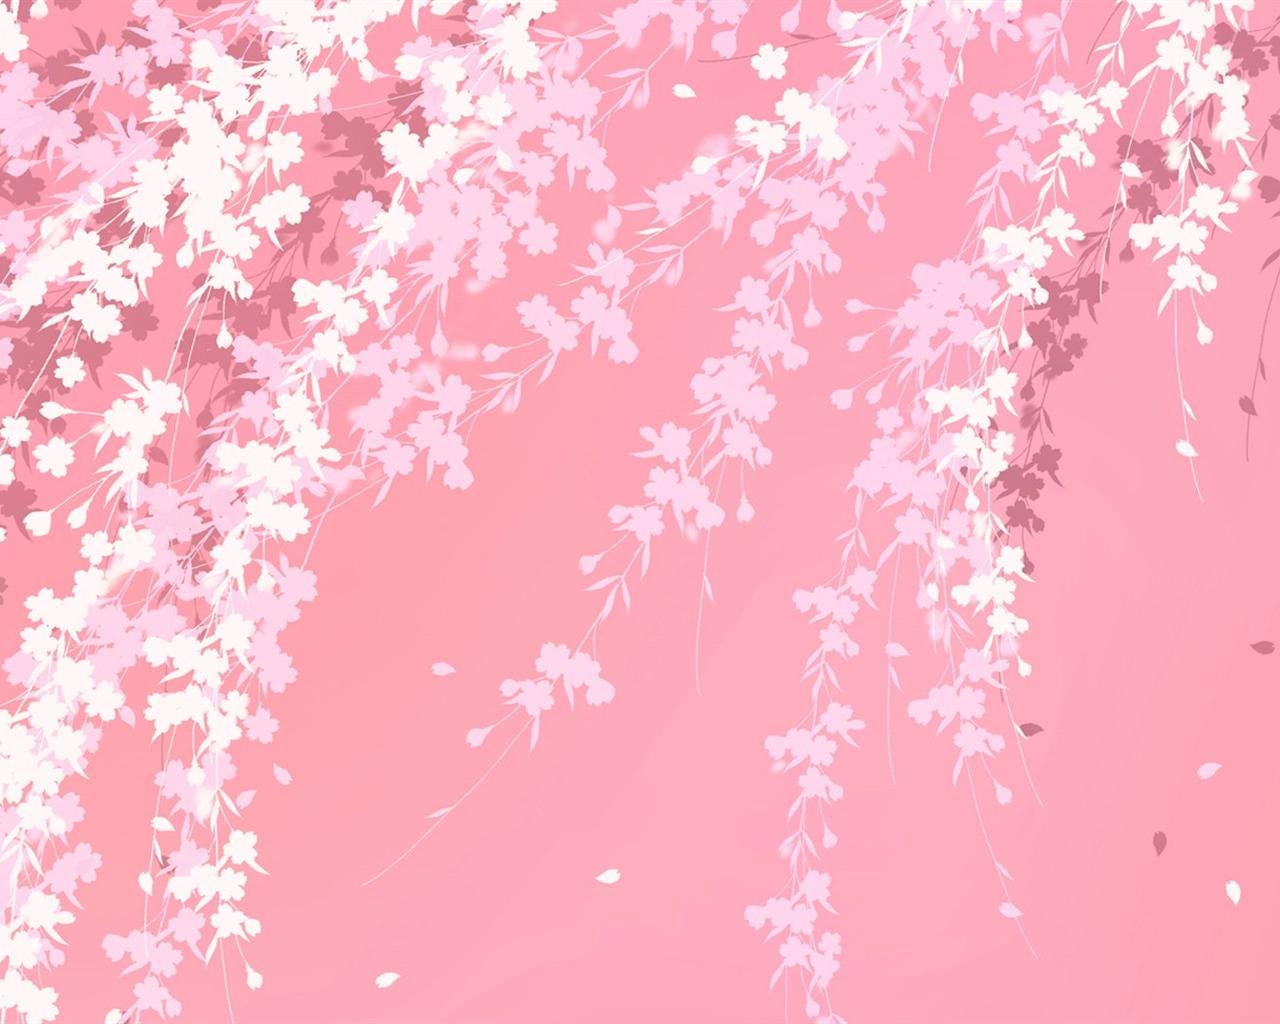 Japan-Stil Tapete Muster und Farbe #5 - 1280x1024 ...